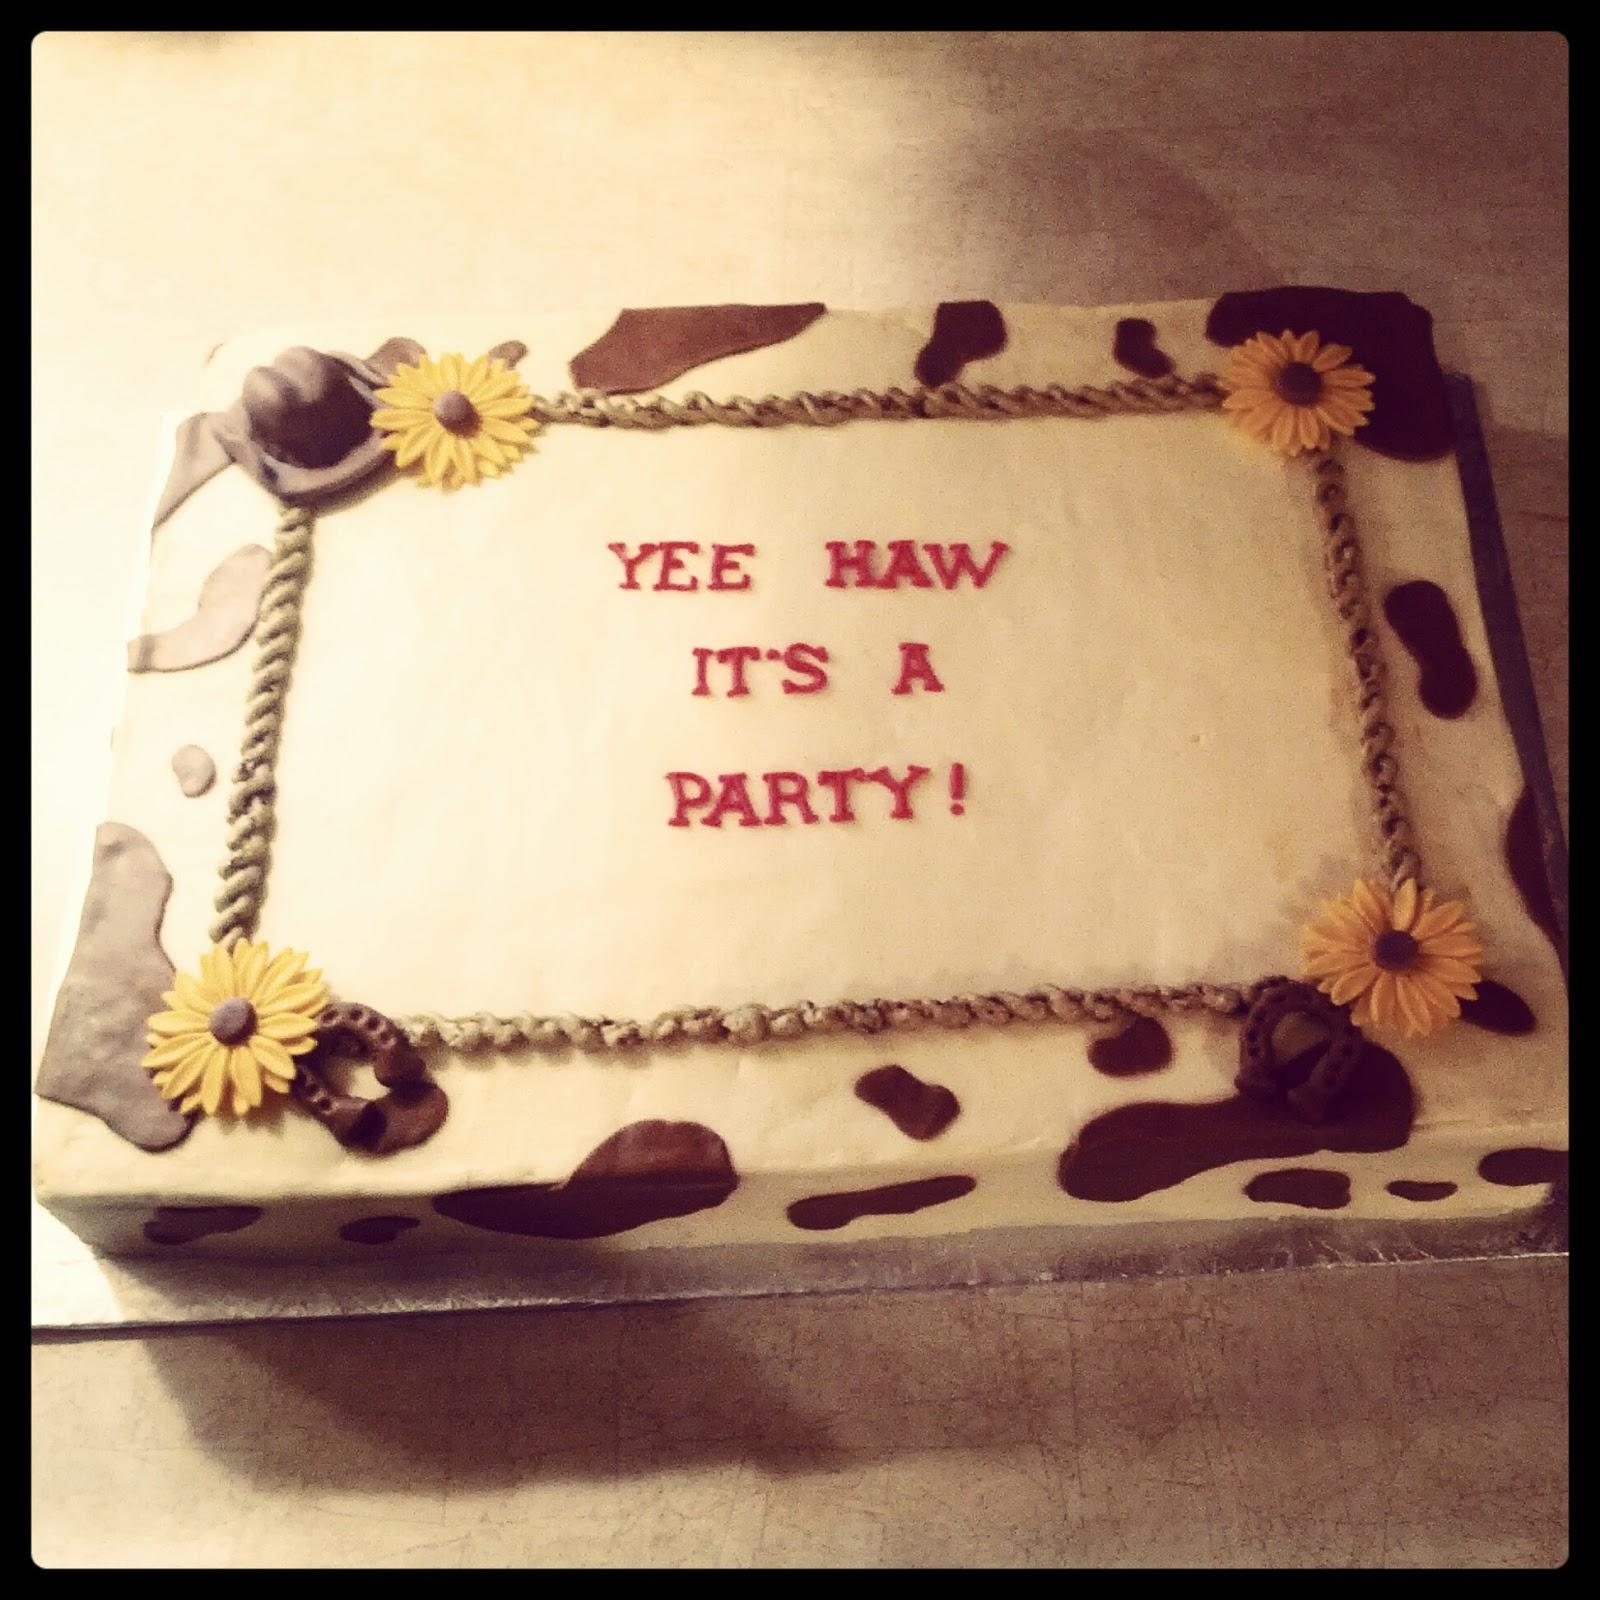 Second Generation Cake Design Country Western Birthday Slab Cake